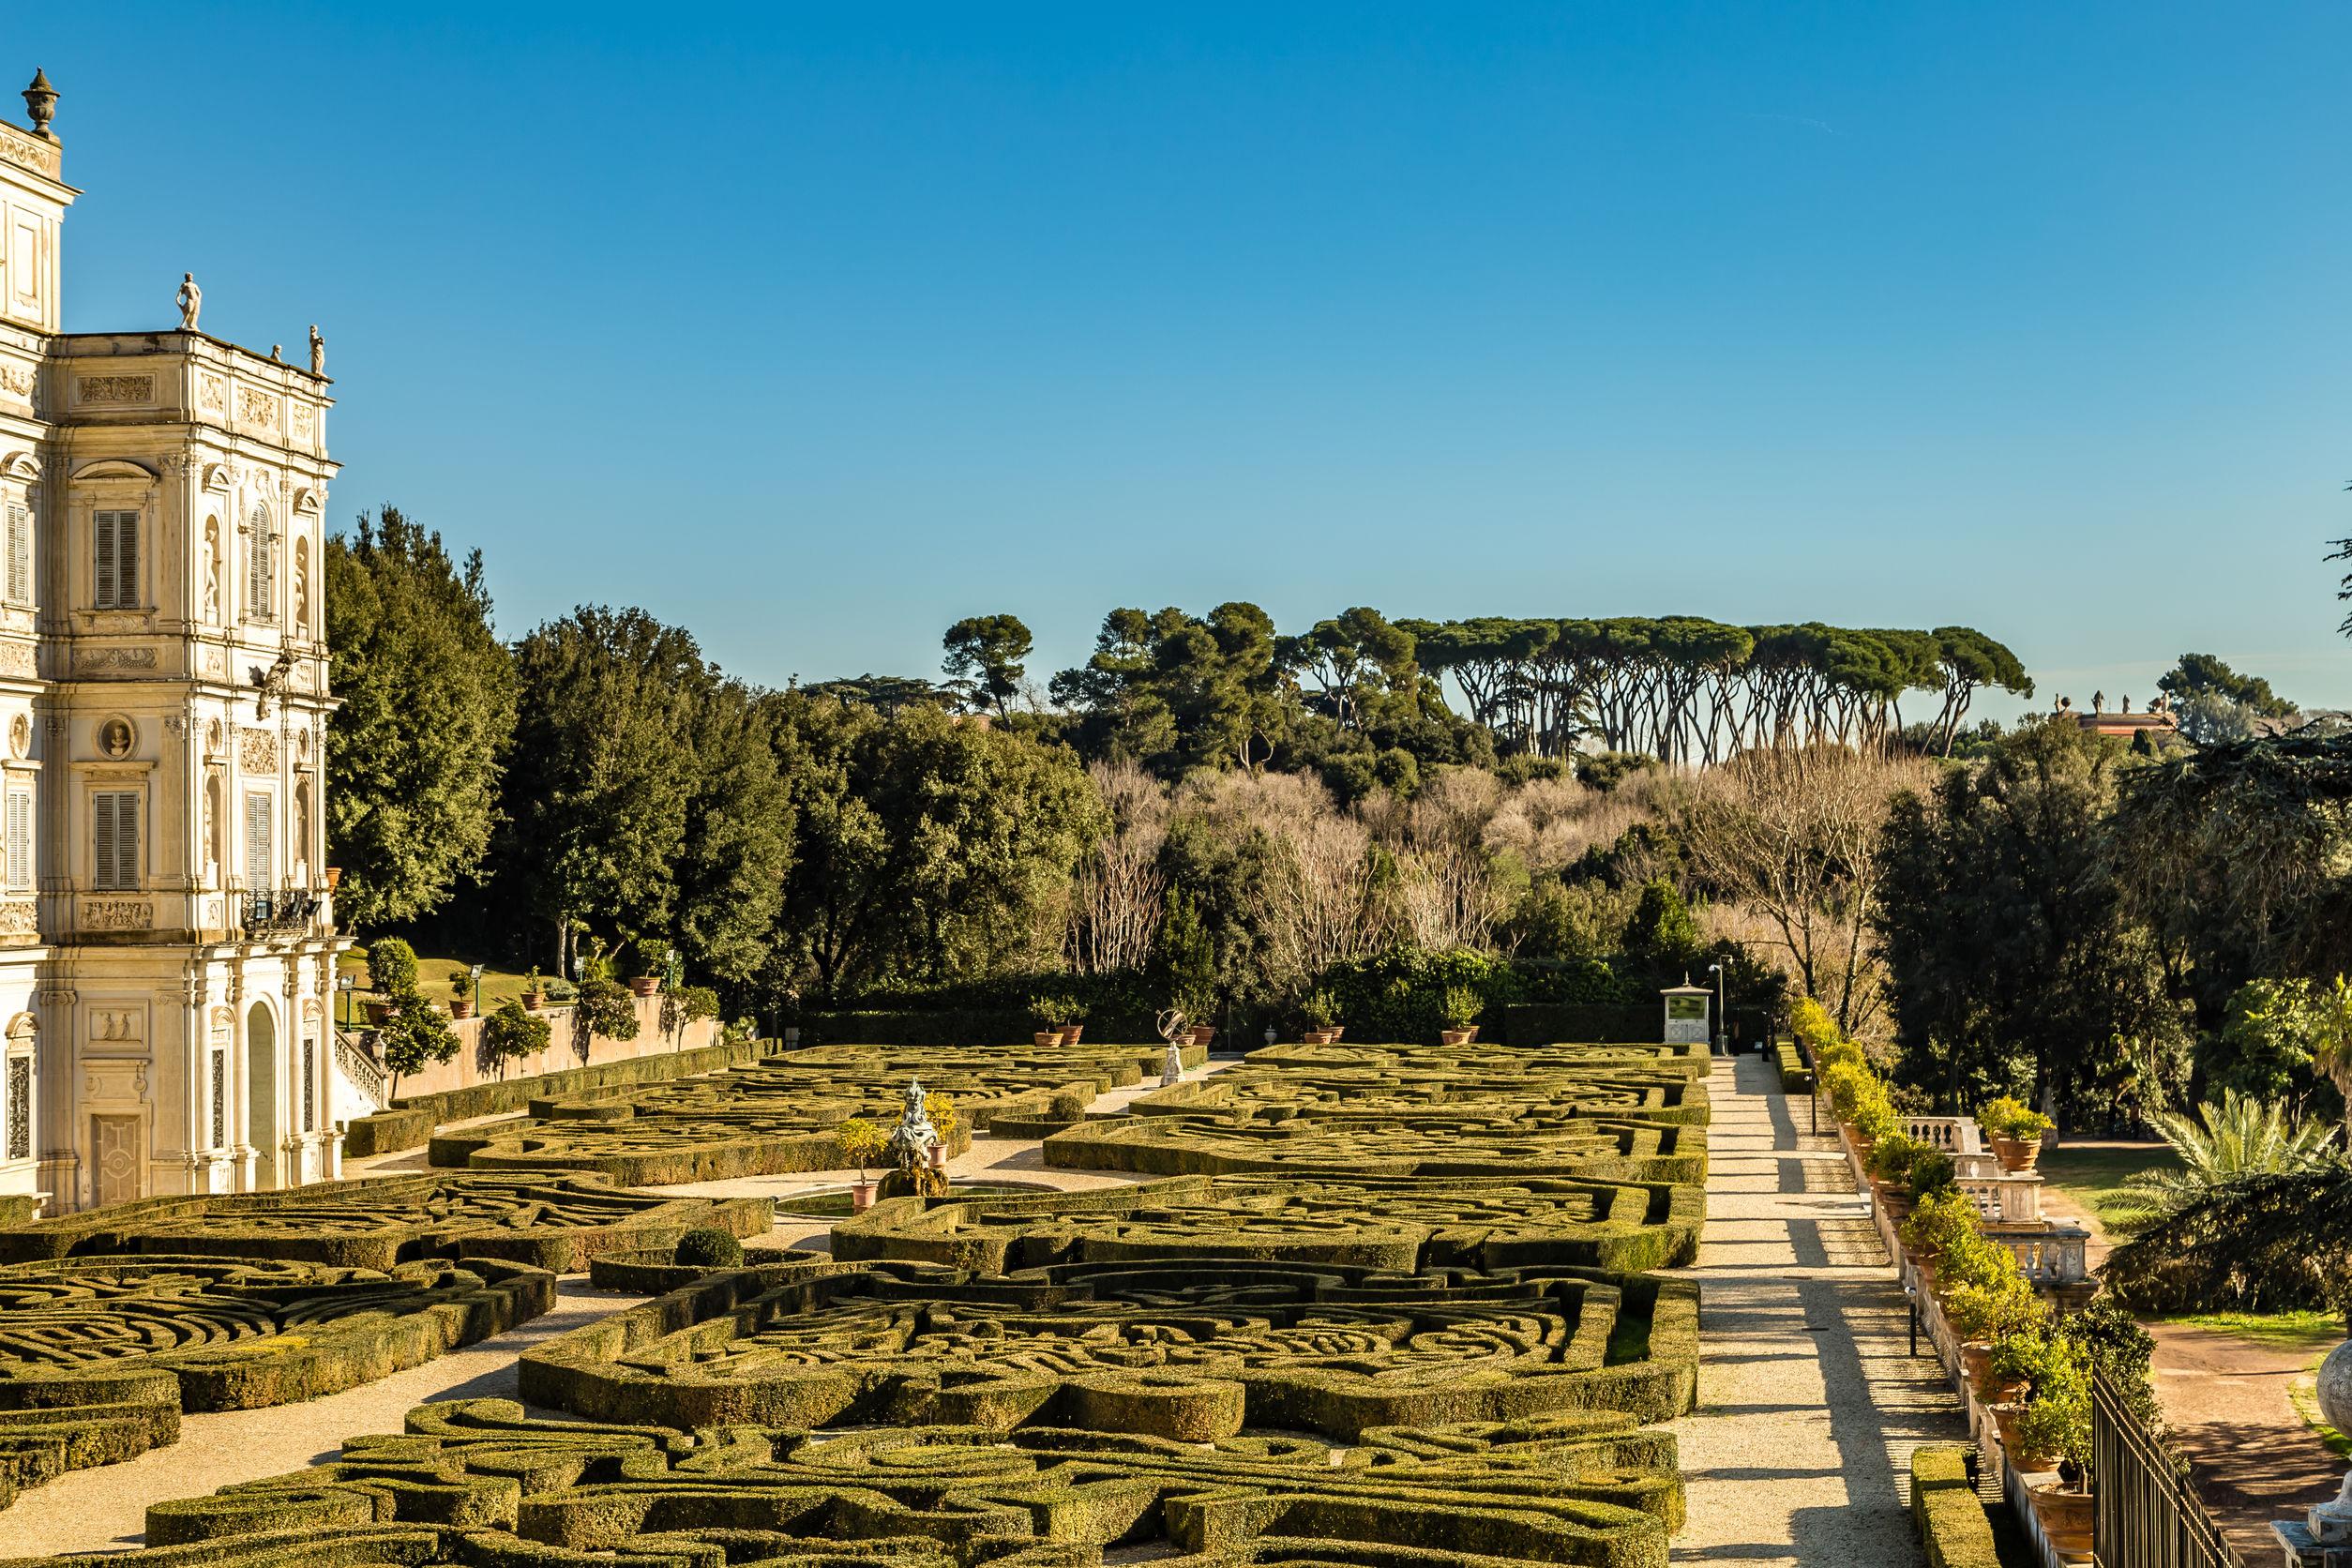 Villa Doria Pamphili w Rzymie